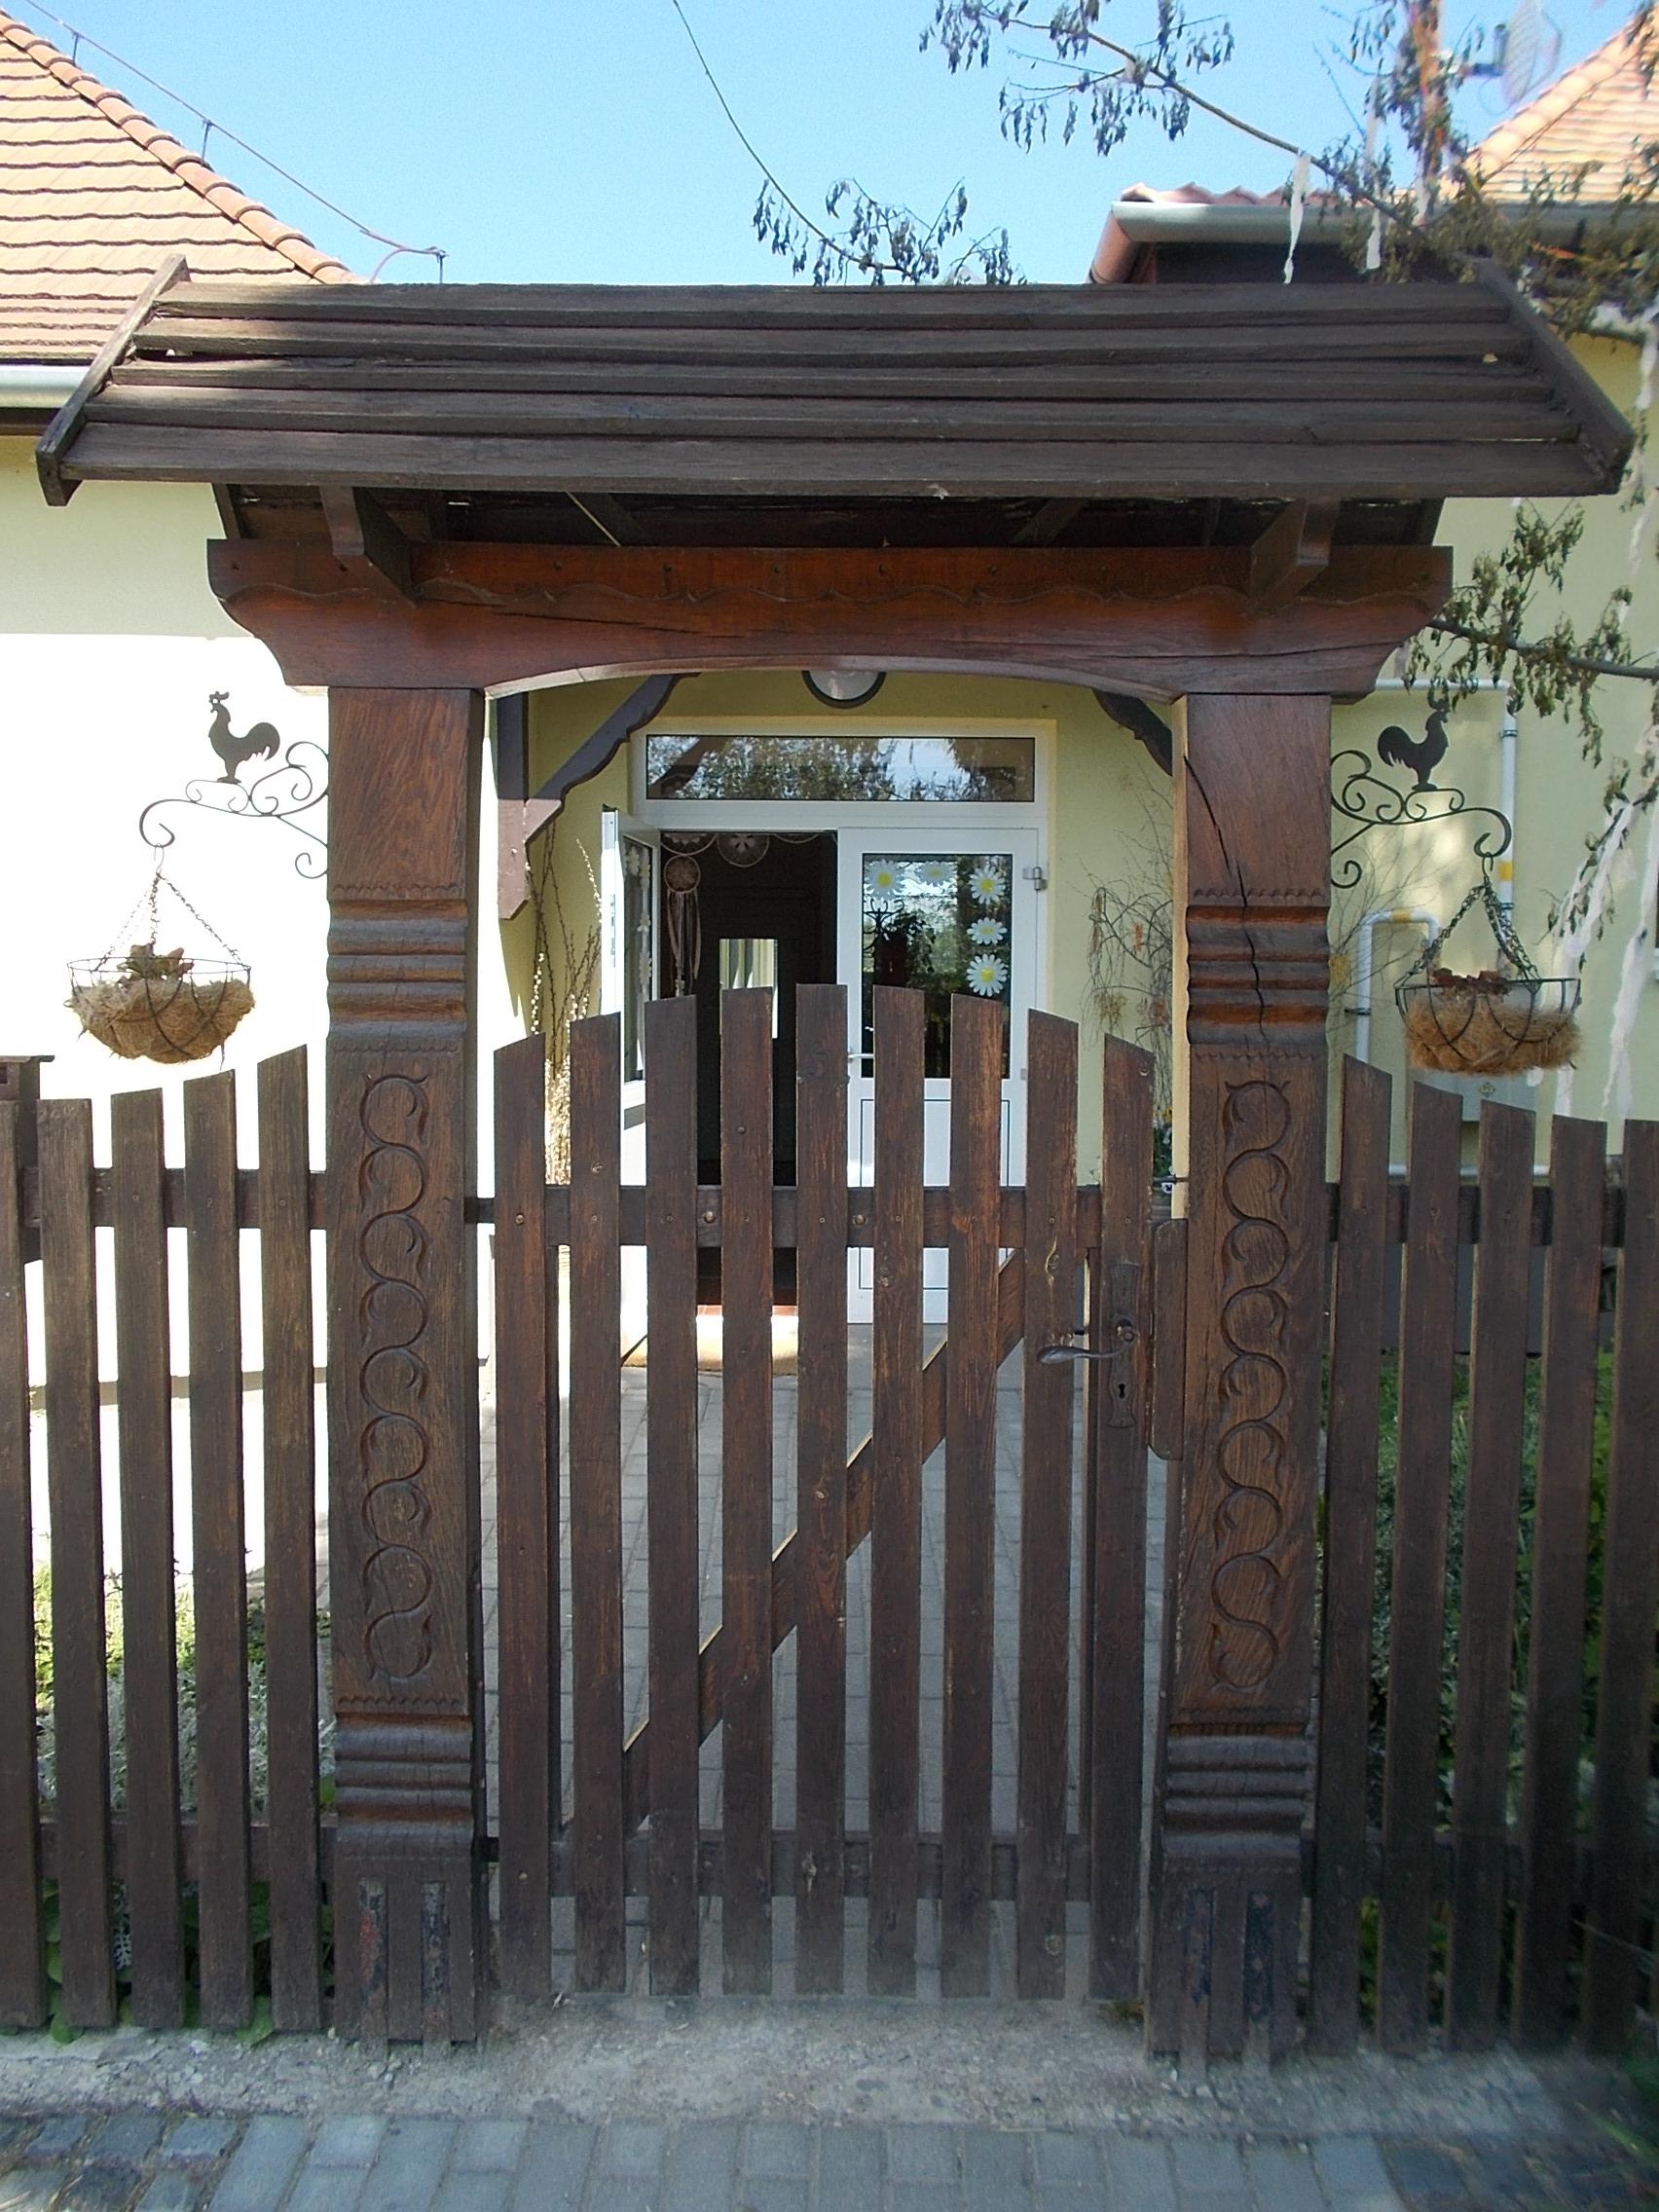 File:Kindergarten, wooden gate, Vörösmarty Street, Dinnyés, 2017 Gárdony.jpg